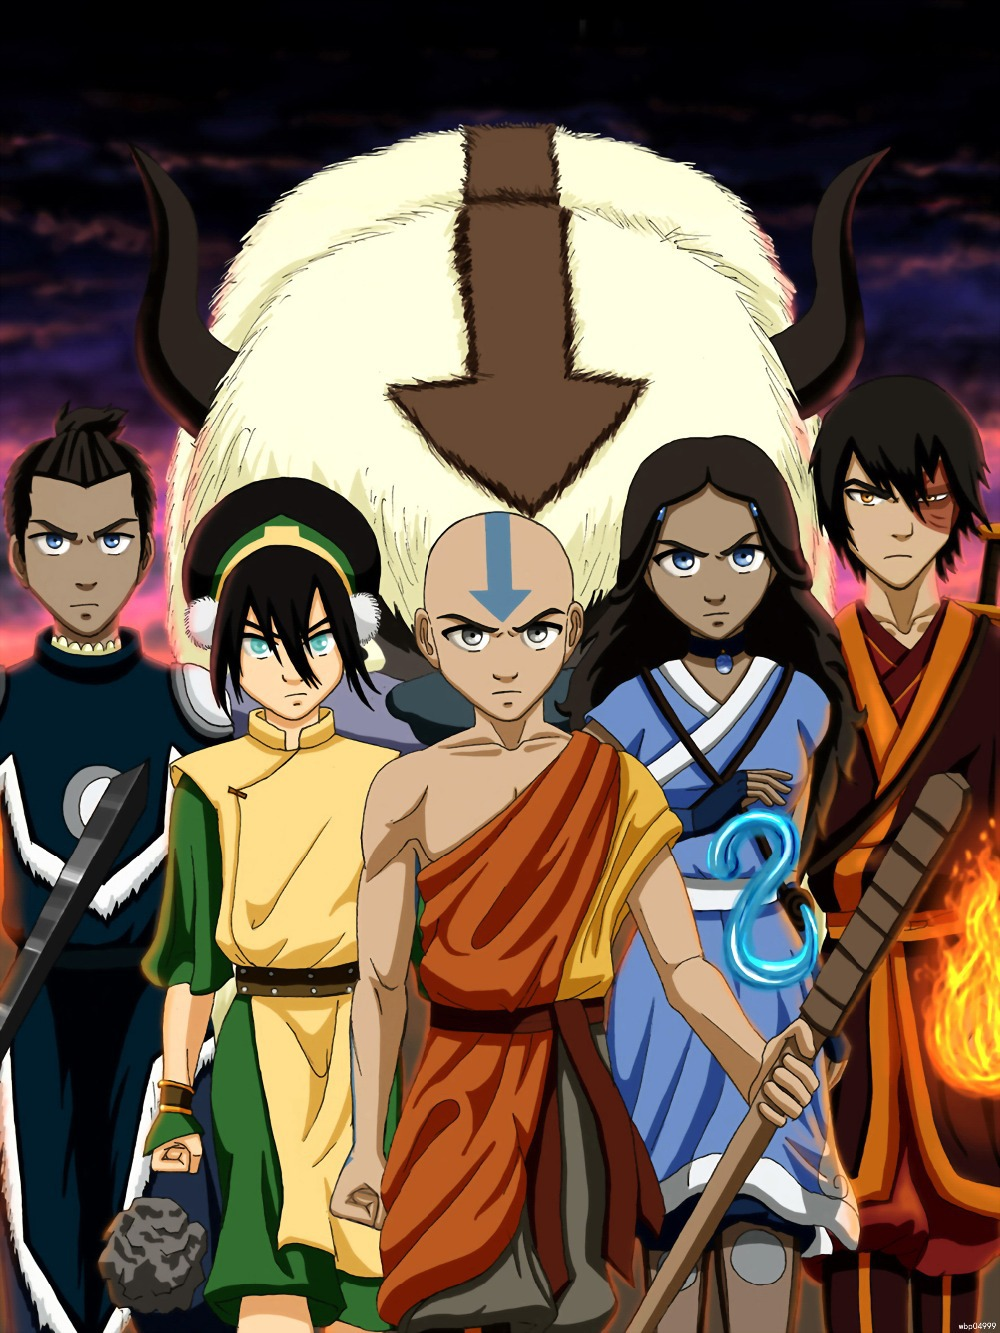 Avatar The Last Airbender Anime Manga Wall Stickers Art -1151